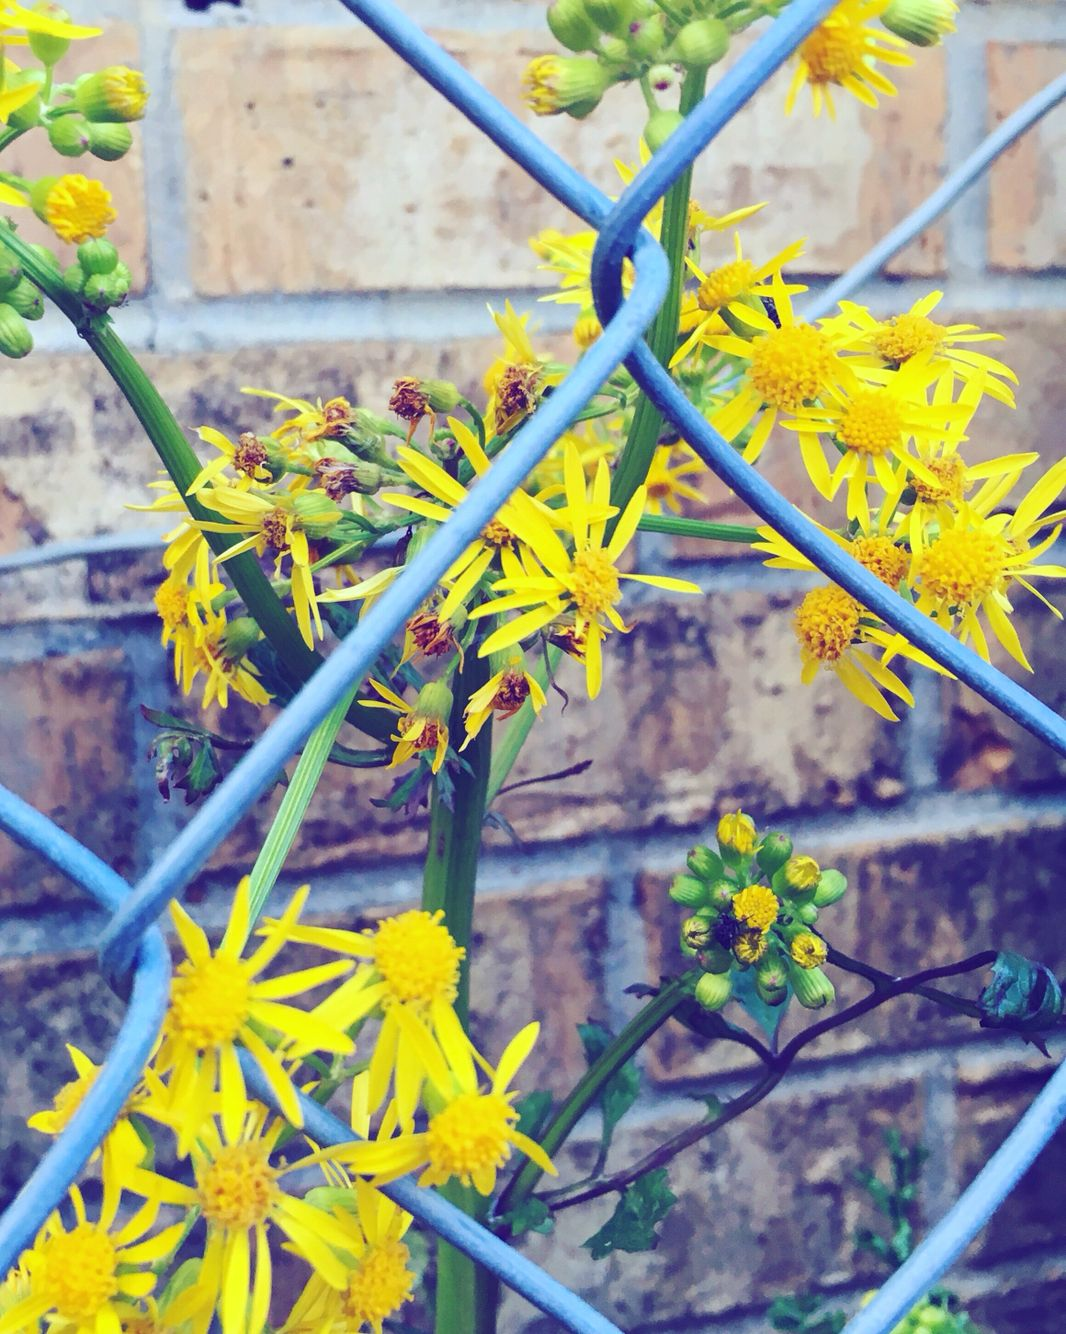 LF #oldbrick #brick #brickhouse #fence #fenceofflowers #yellowflowers #greenstem #greengrass #yellow #green #yellowandgreens #brickandflowers #fenceandflowers #flowersandbrick #greenandyellow #natureisbeautiful